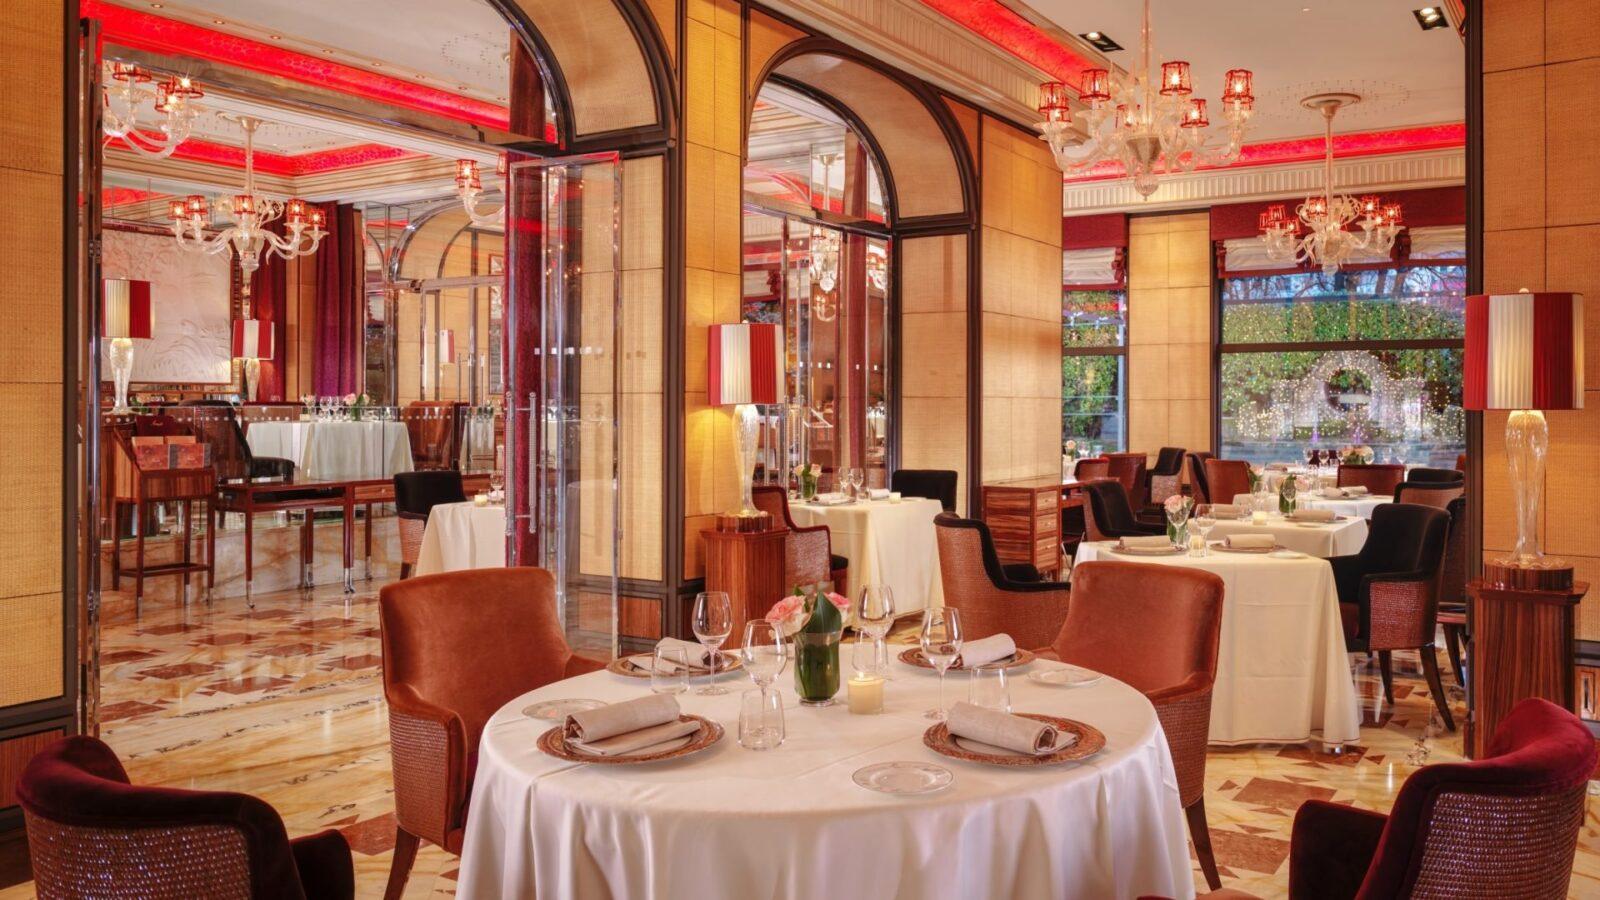 Acanto Restaurant at Hotel Principe di Savoia, Milan